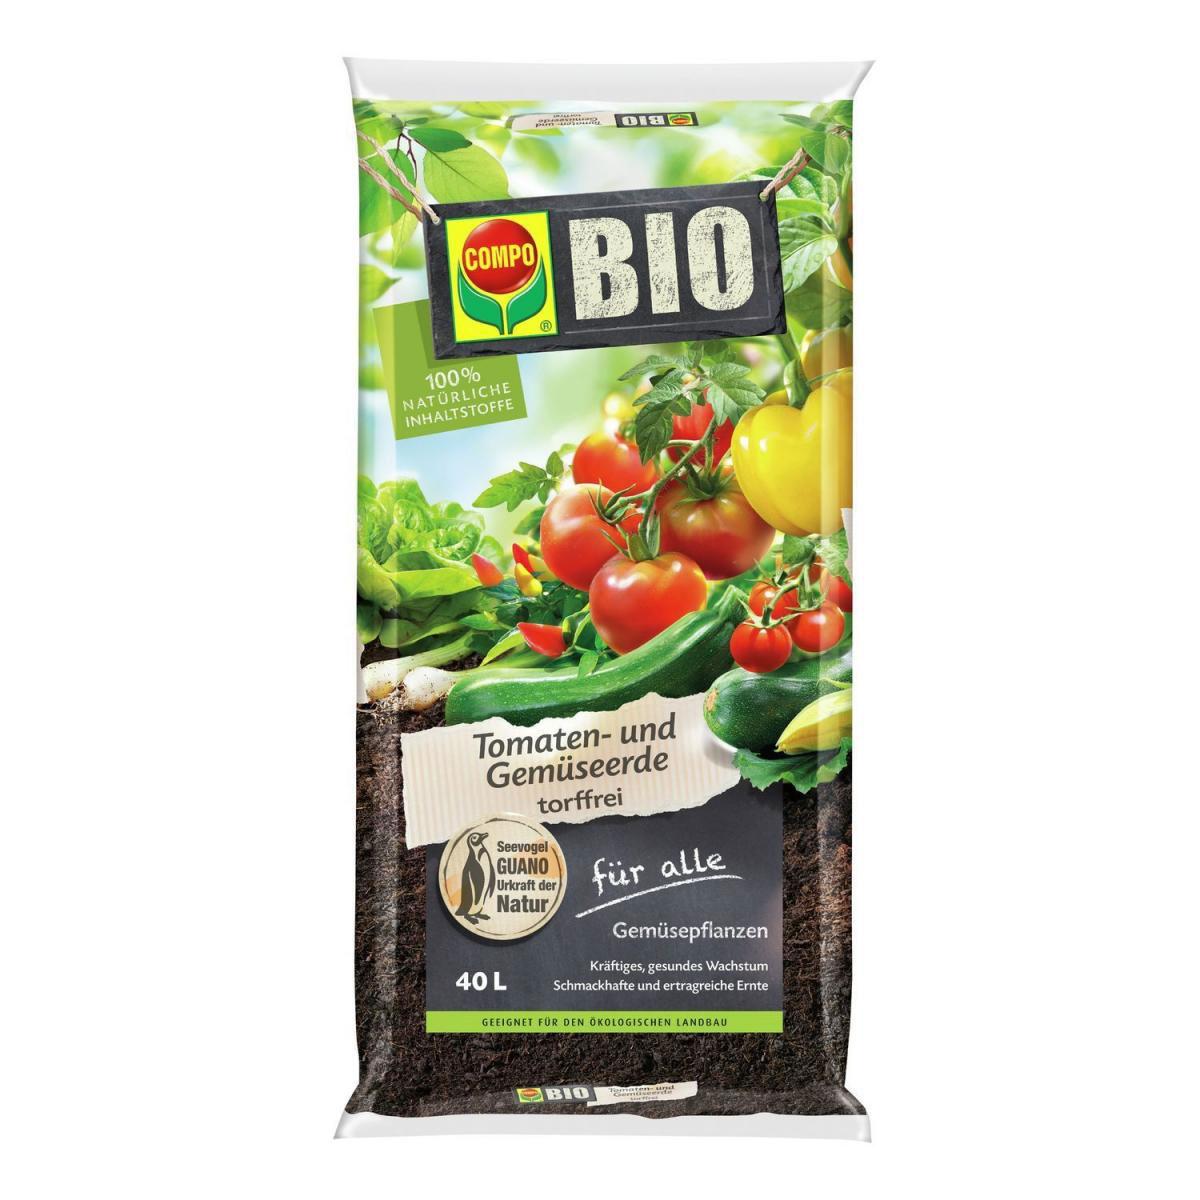 Compo BIO Tomaten- & Gemüseerde torffrei 40 L